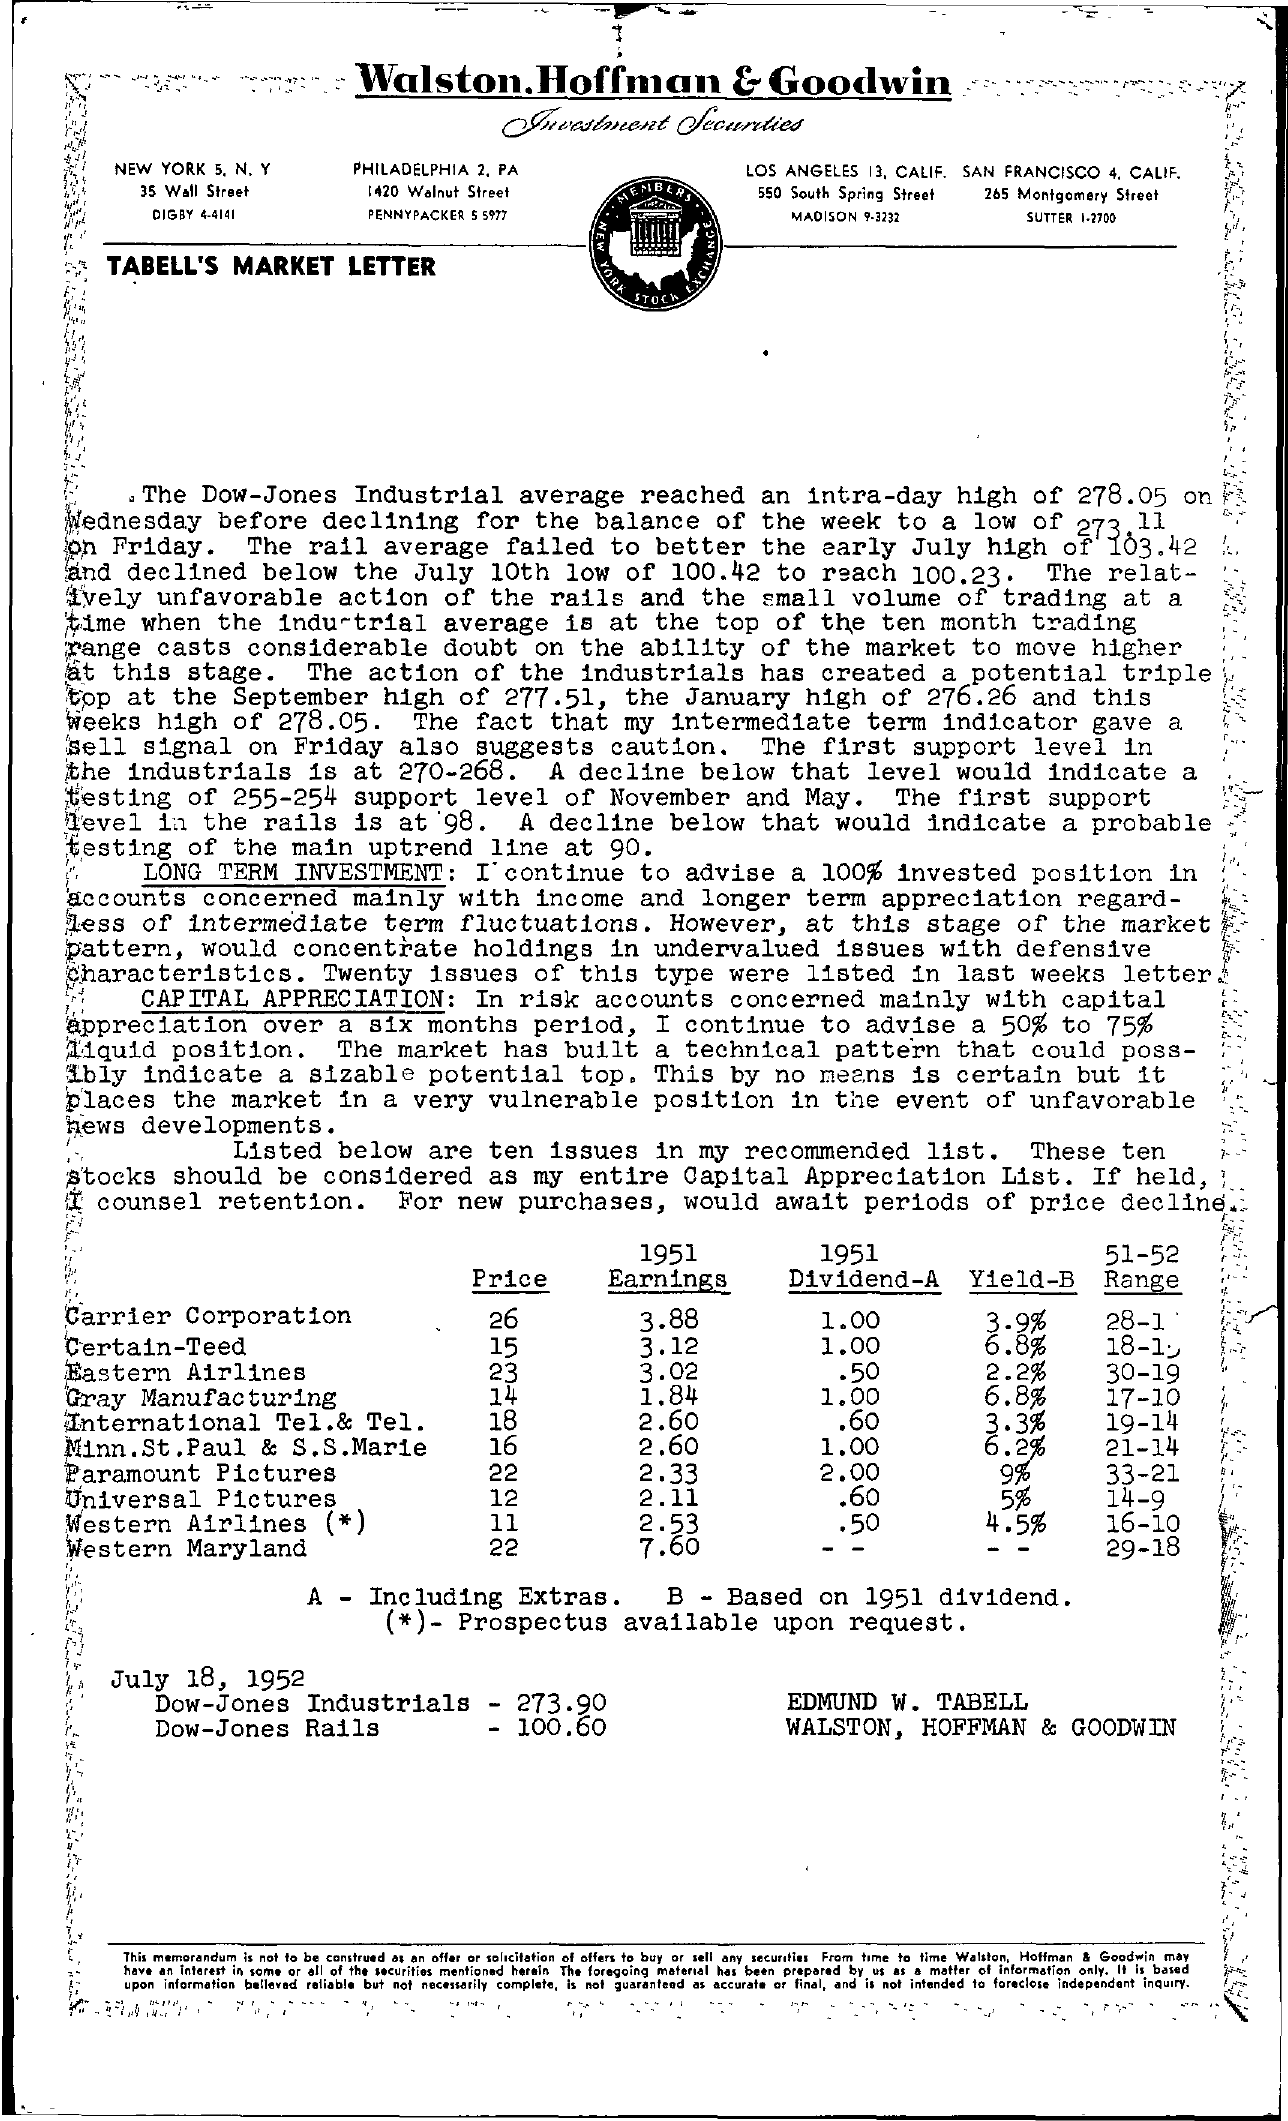 Tabell's Market Letter - July 18, 1952